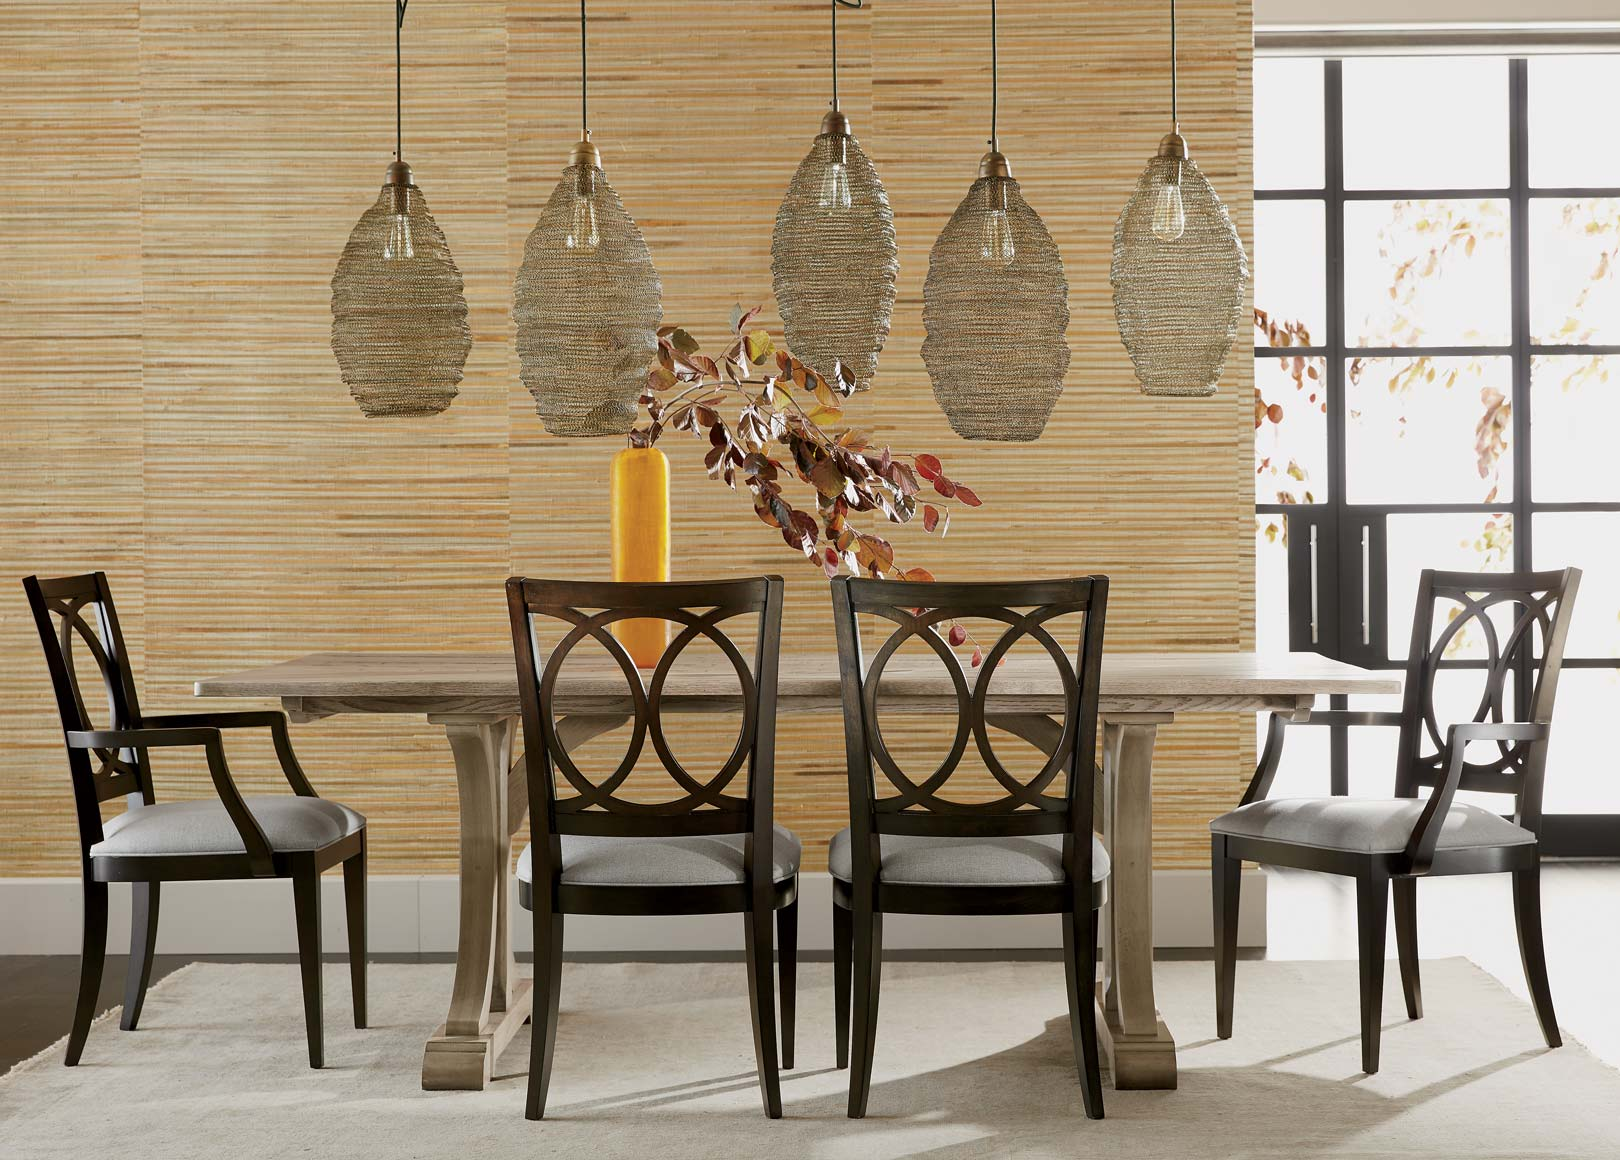 Eclectic Modern Rustic Dining Room Ideas Ethan Allen Design Ethan Allen